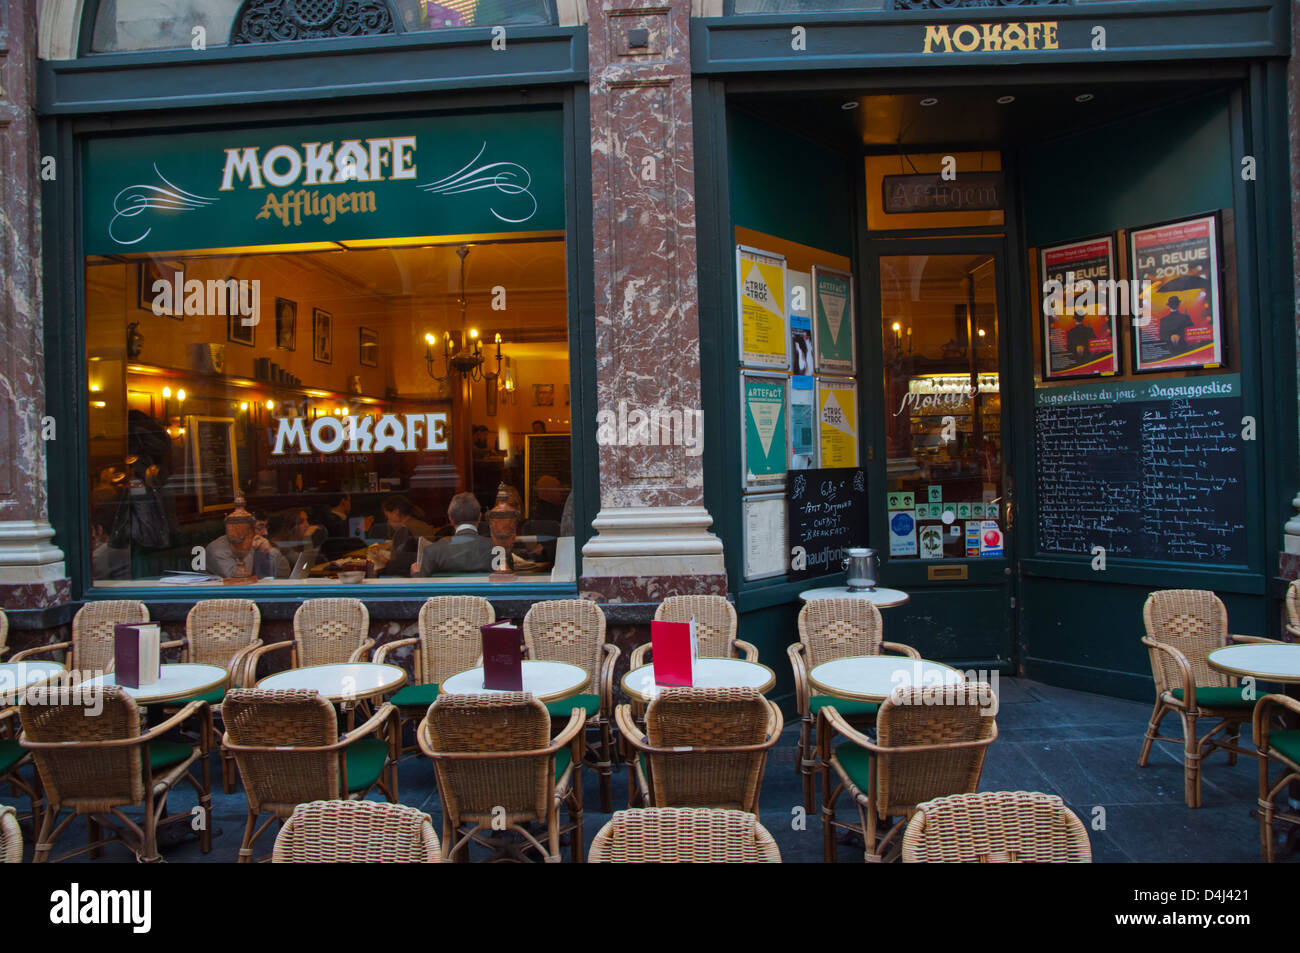 Mokaffe cafe inside Galeries Royales Saint-Hubert or Koninklijke Sint-Hubertusgalerijen shopping arcade Brussels - Stock Image